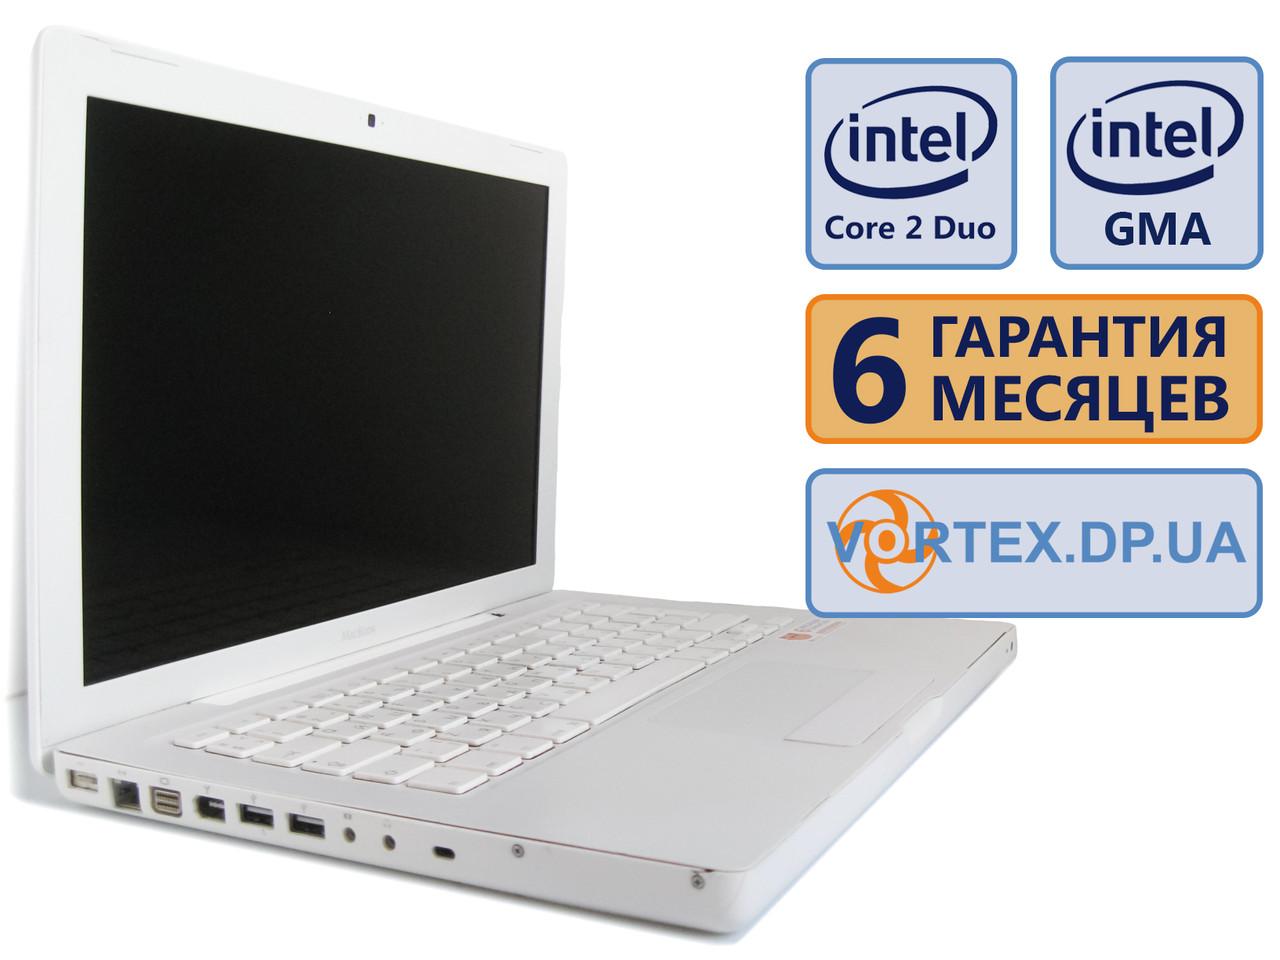 Ноутбук Apple A1181 13.3 (1280x800) / Intel Core 2 Duo T8100 (2x2.1) / RAM 3Gb / HDD 120Gb / Сост. 9/10 БУ / Win 7